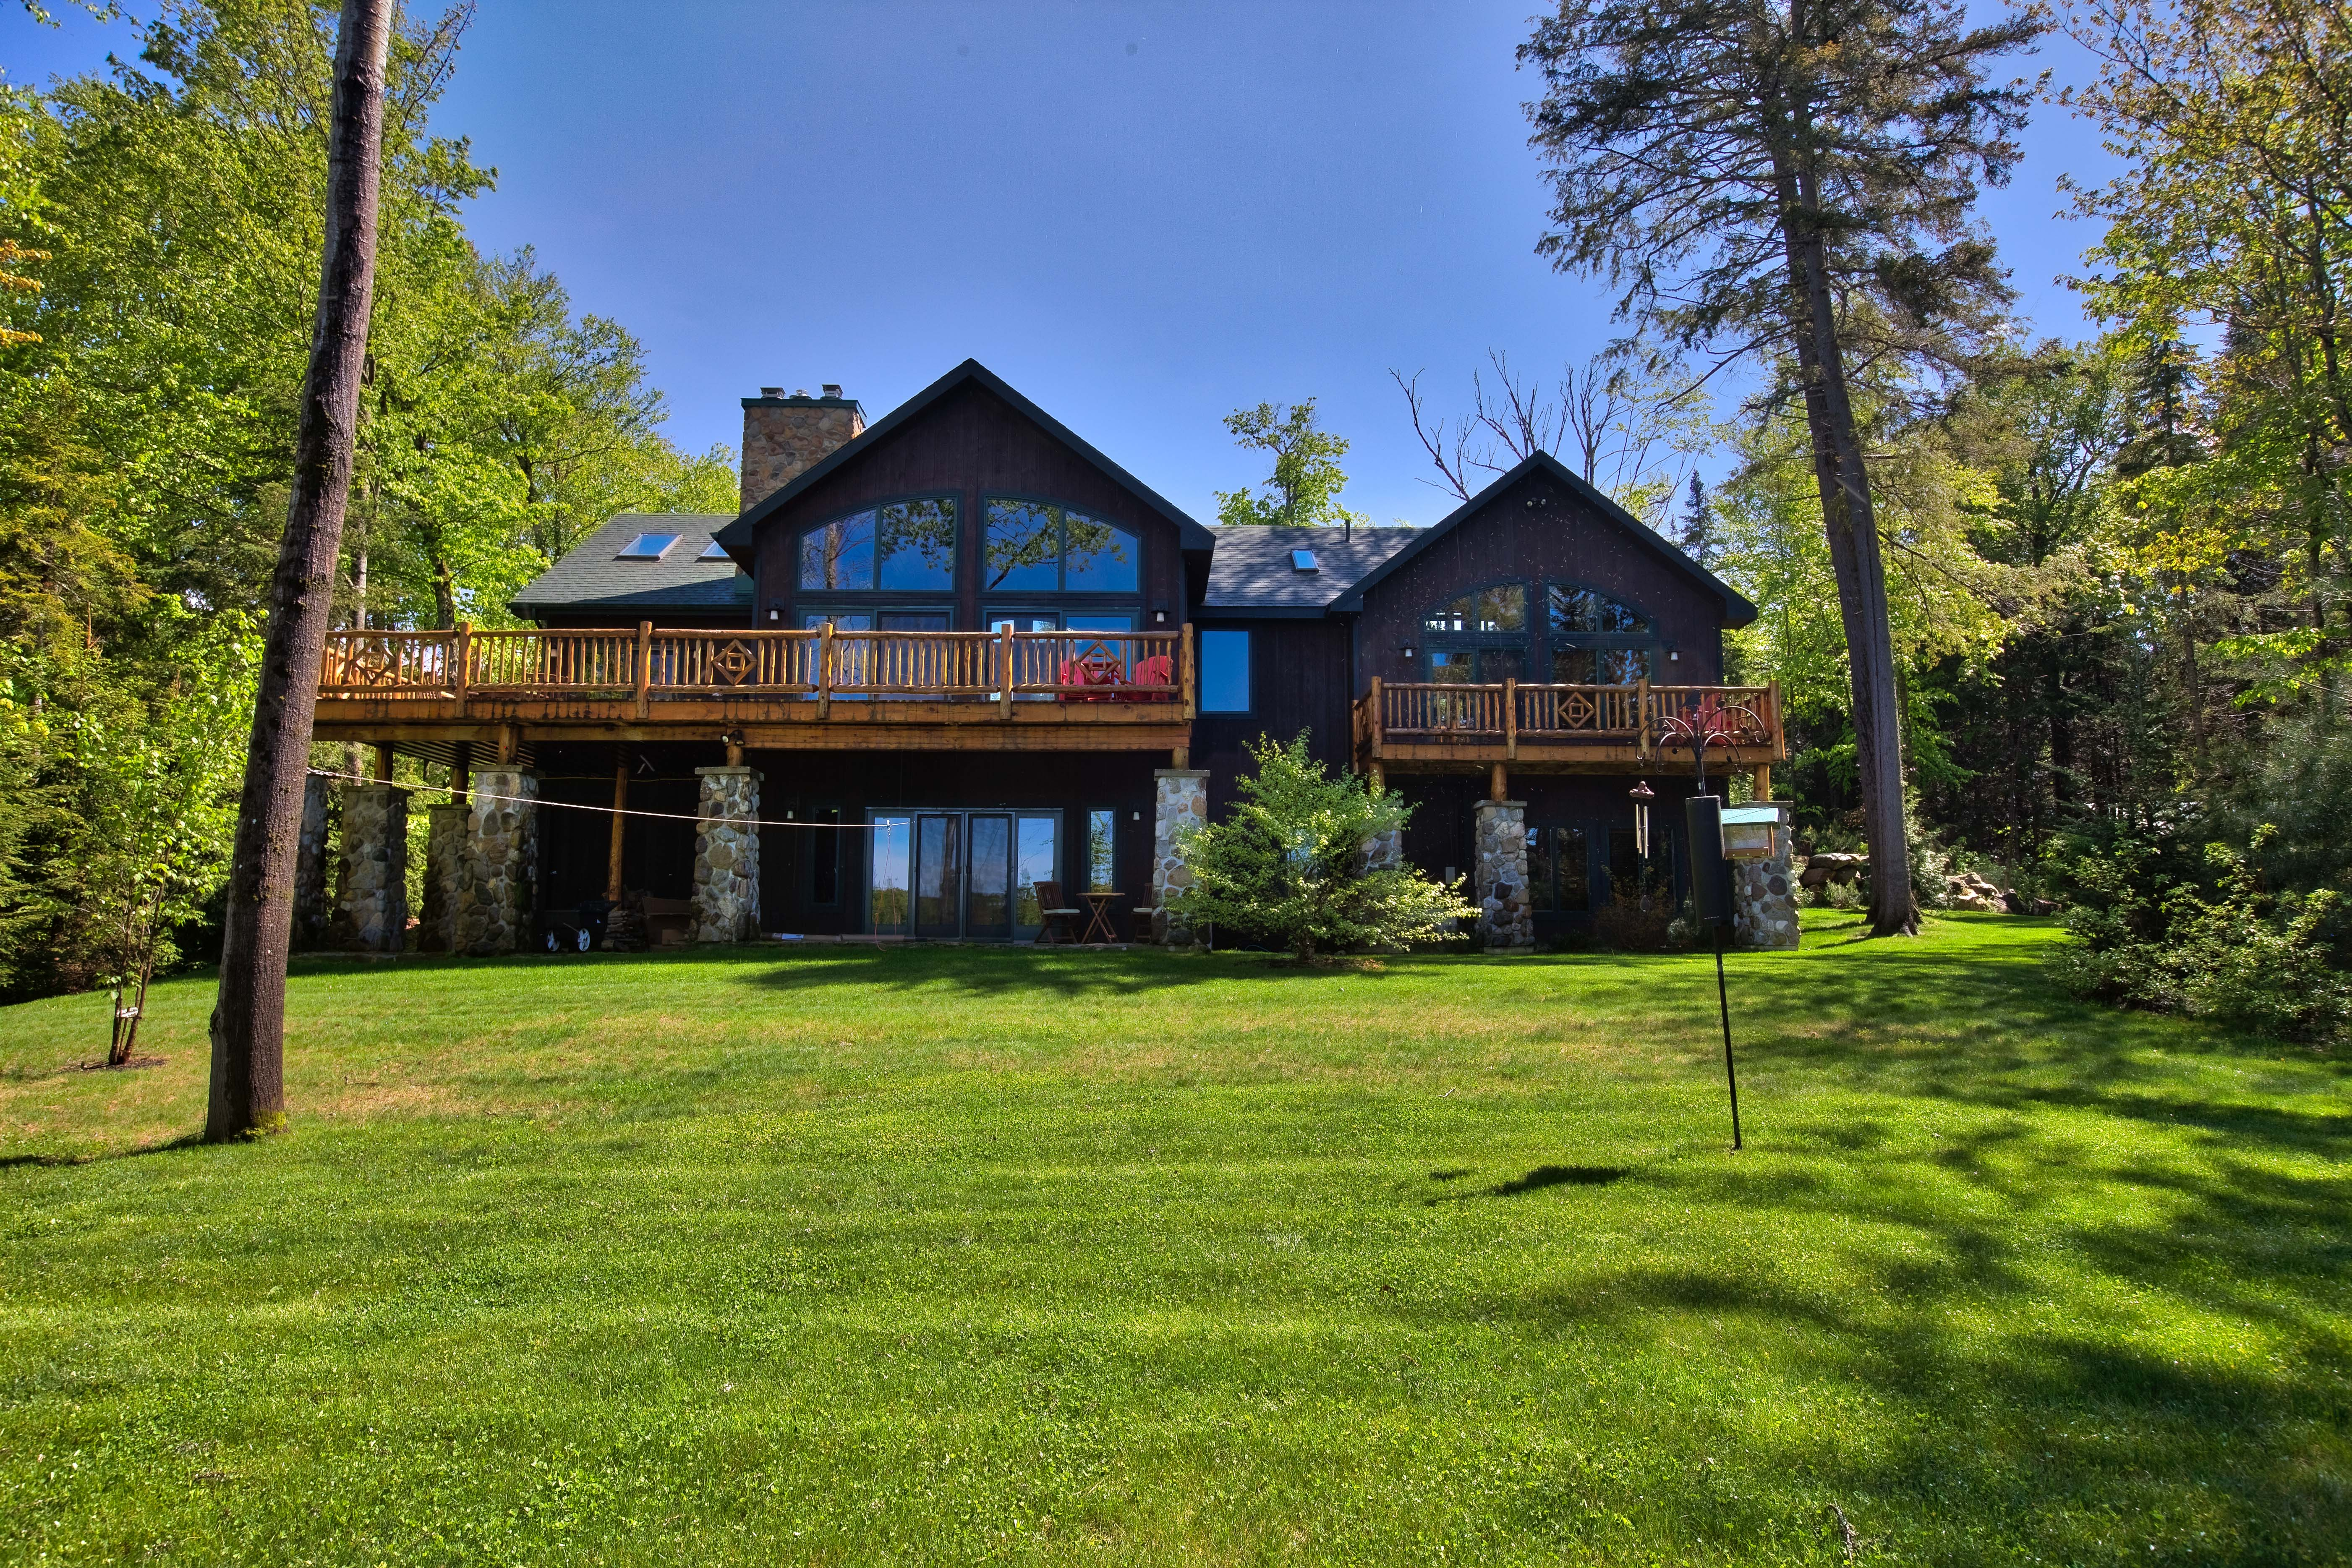 malone pine adirondacks classic rentals cottages adirondack white cabin rental homes camp cabins lodging visit